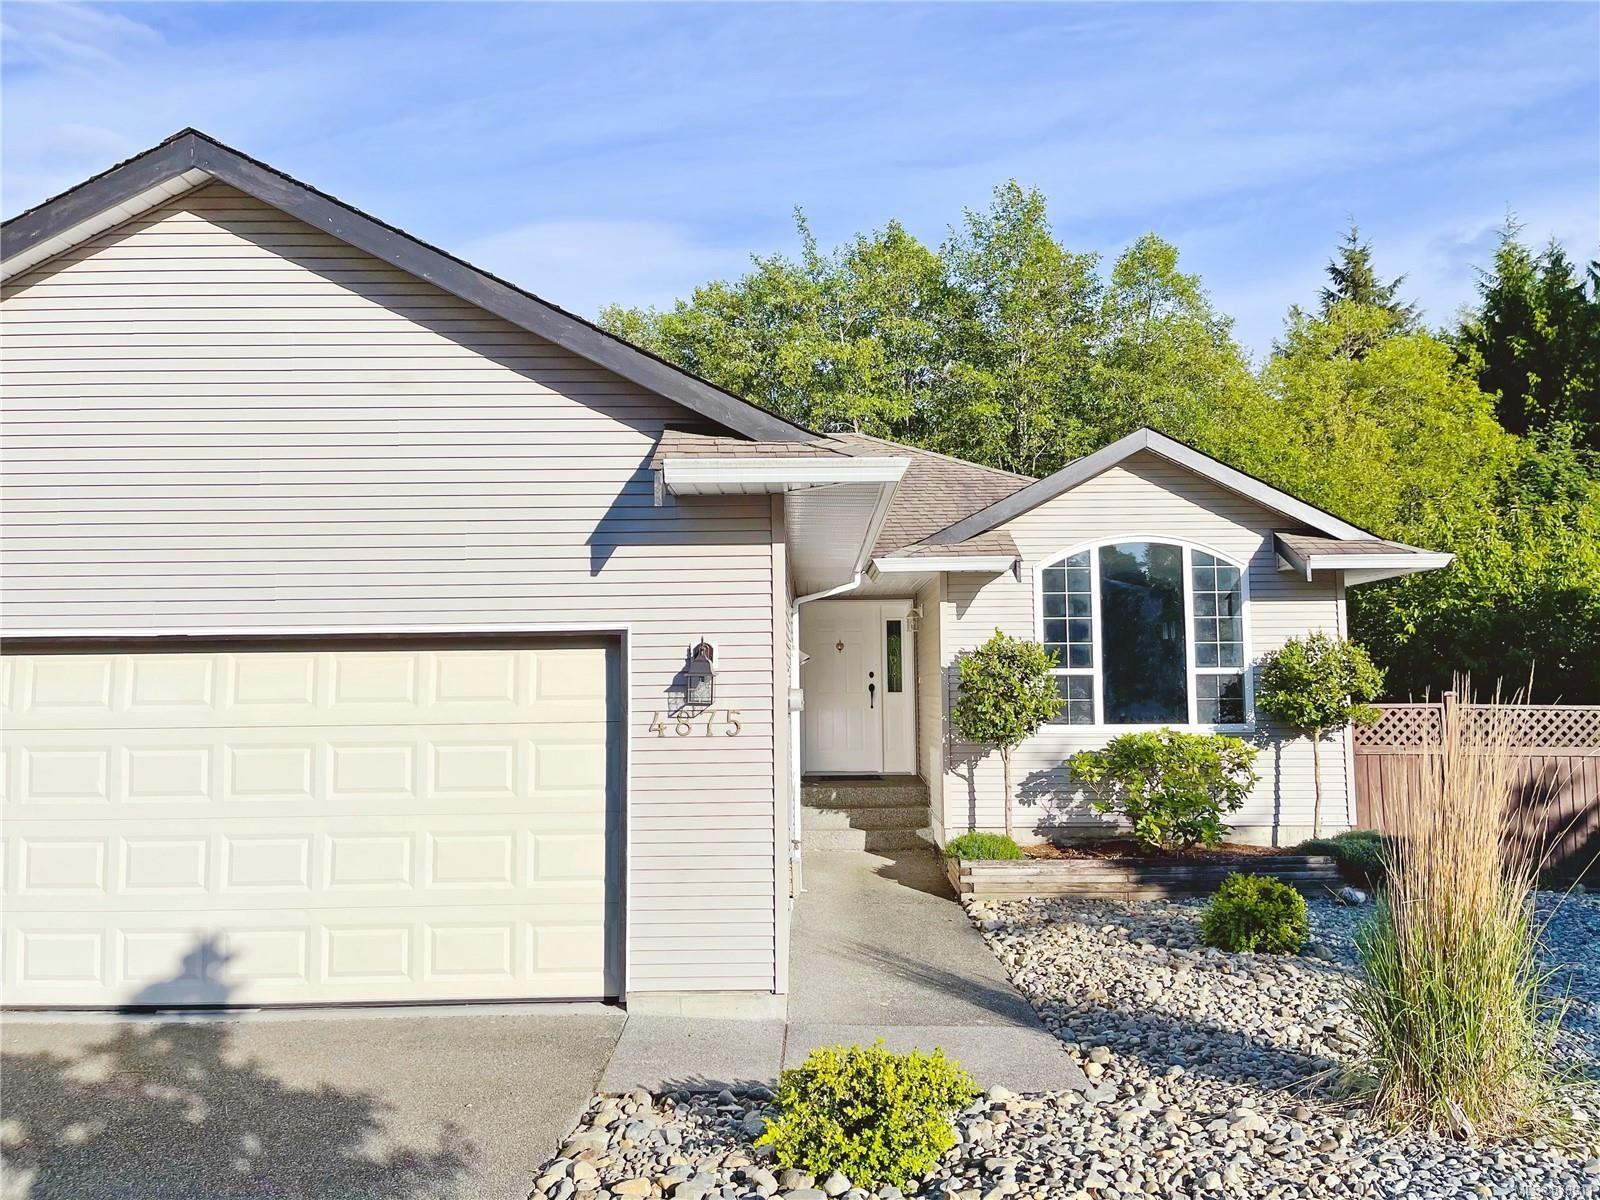 Main Photo: 4875 Logan's Run in : Na North Nanaimo House for sale (Nanaimo)  : MLS®# 878911